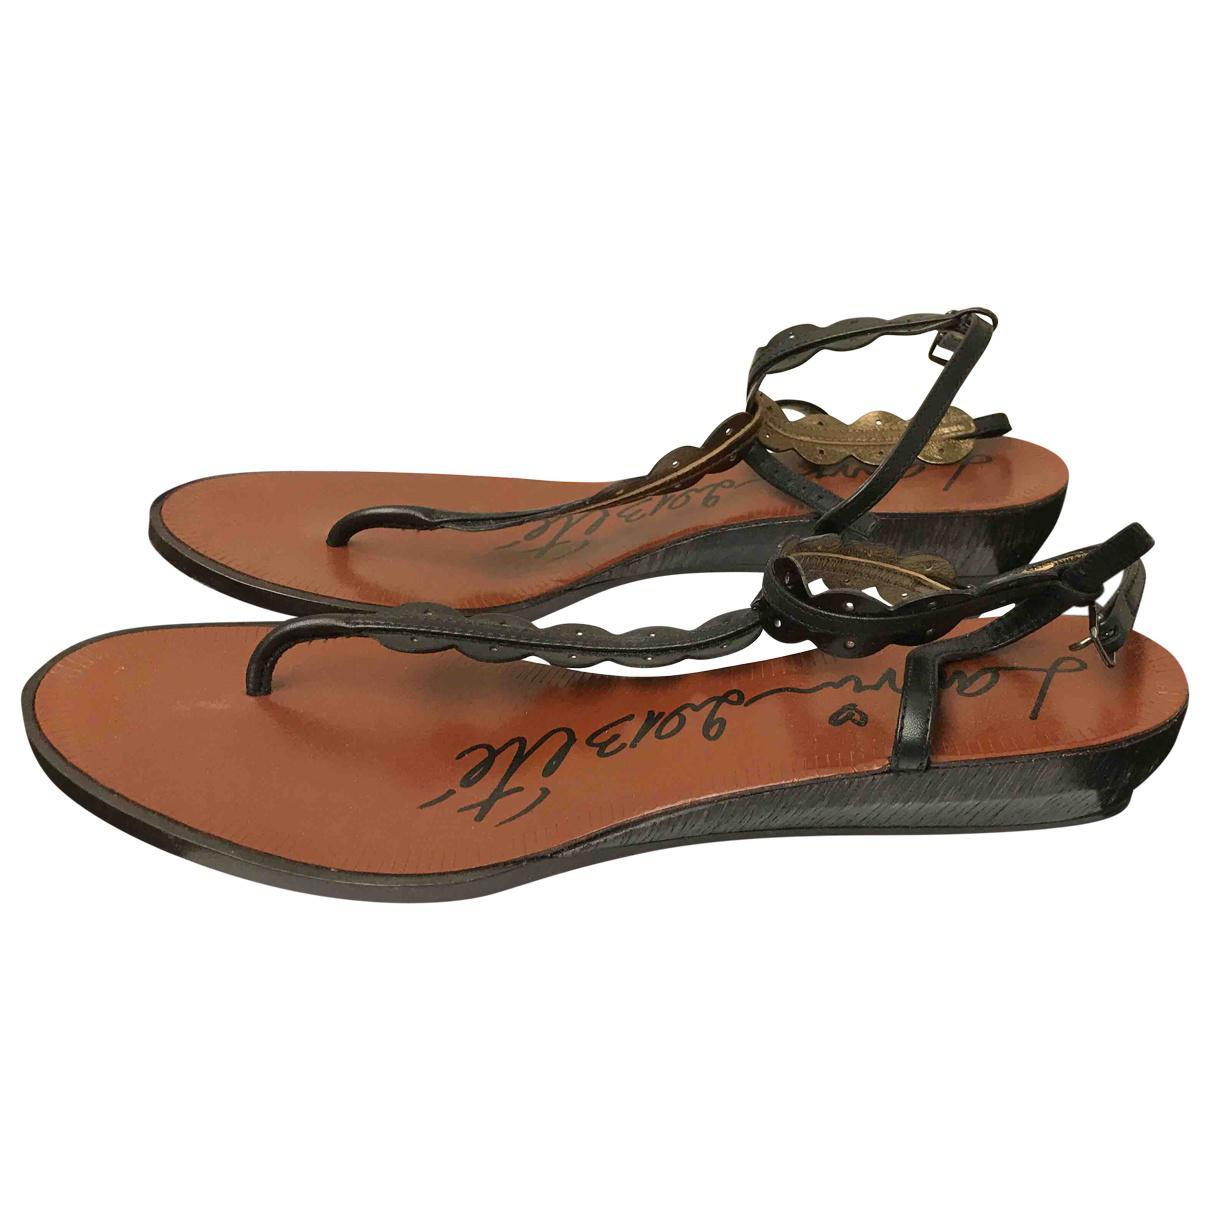 Pre-owned - Leather flip flops Lanvin Largest Supplier Cheap Online bPEADi